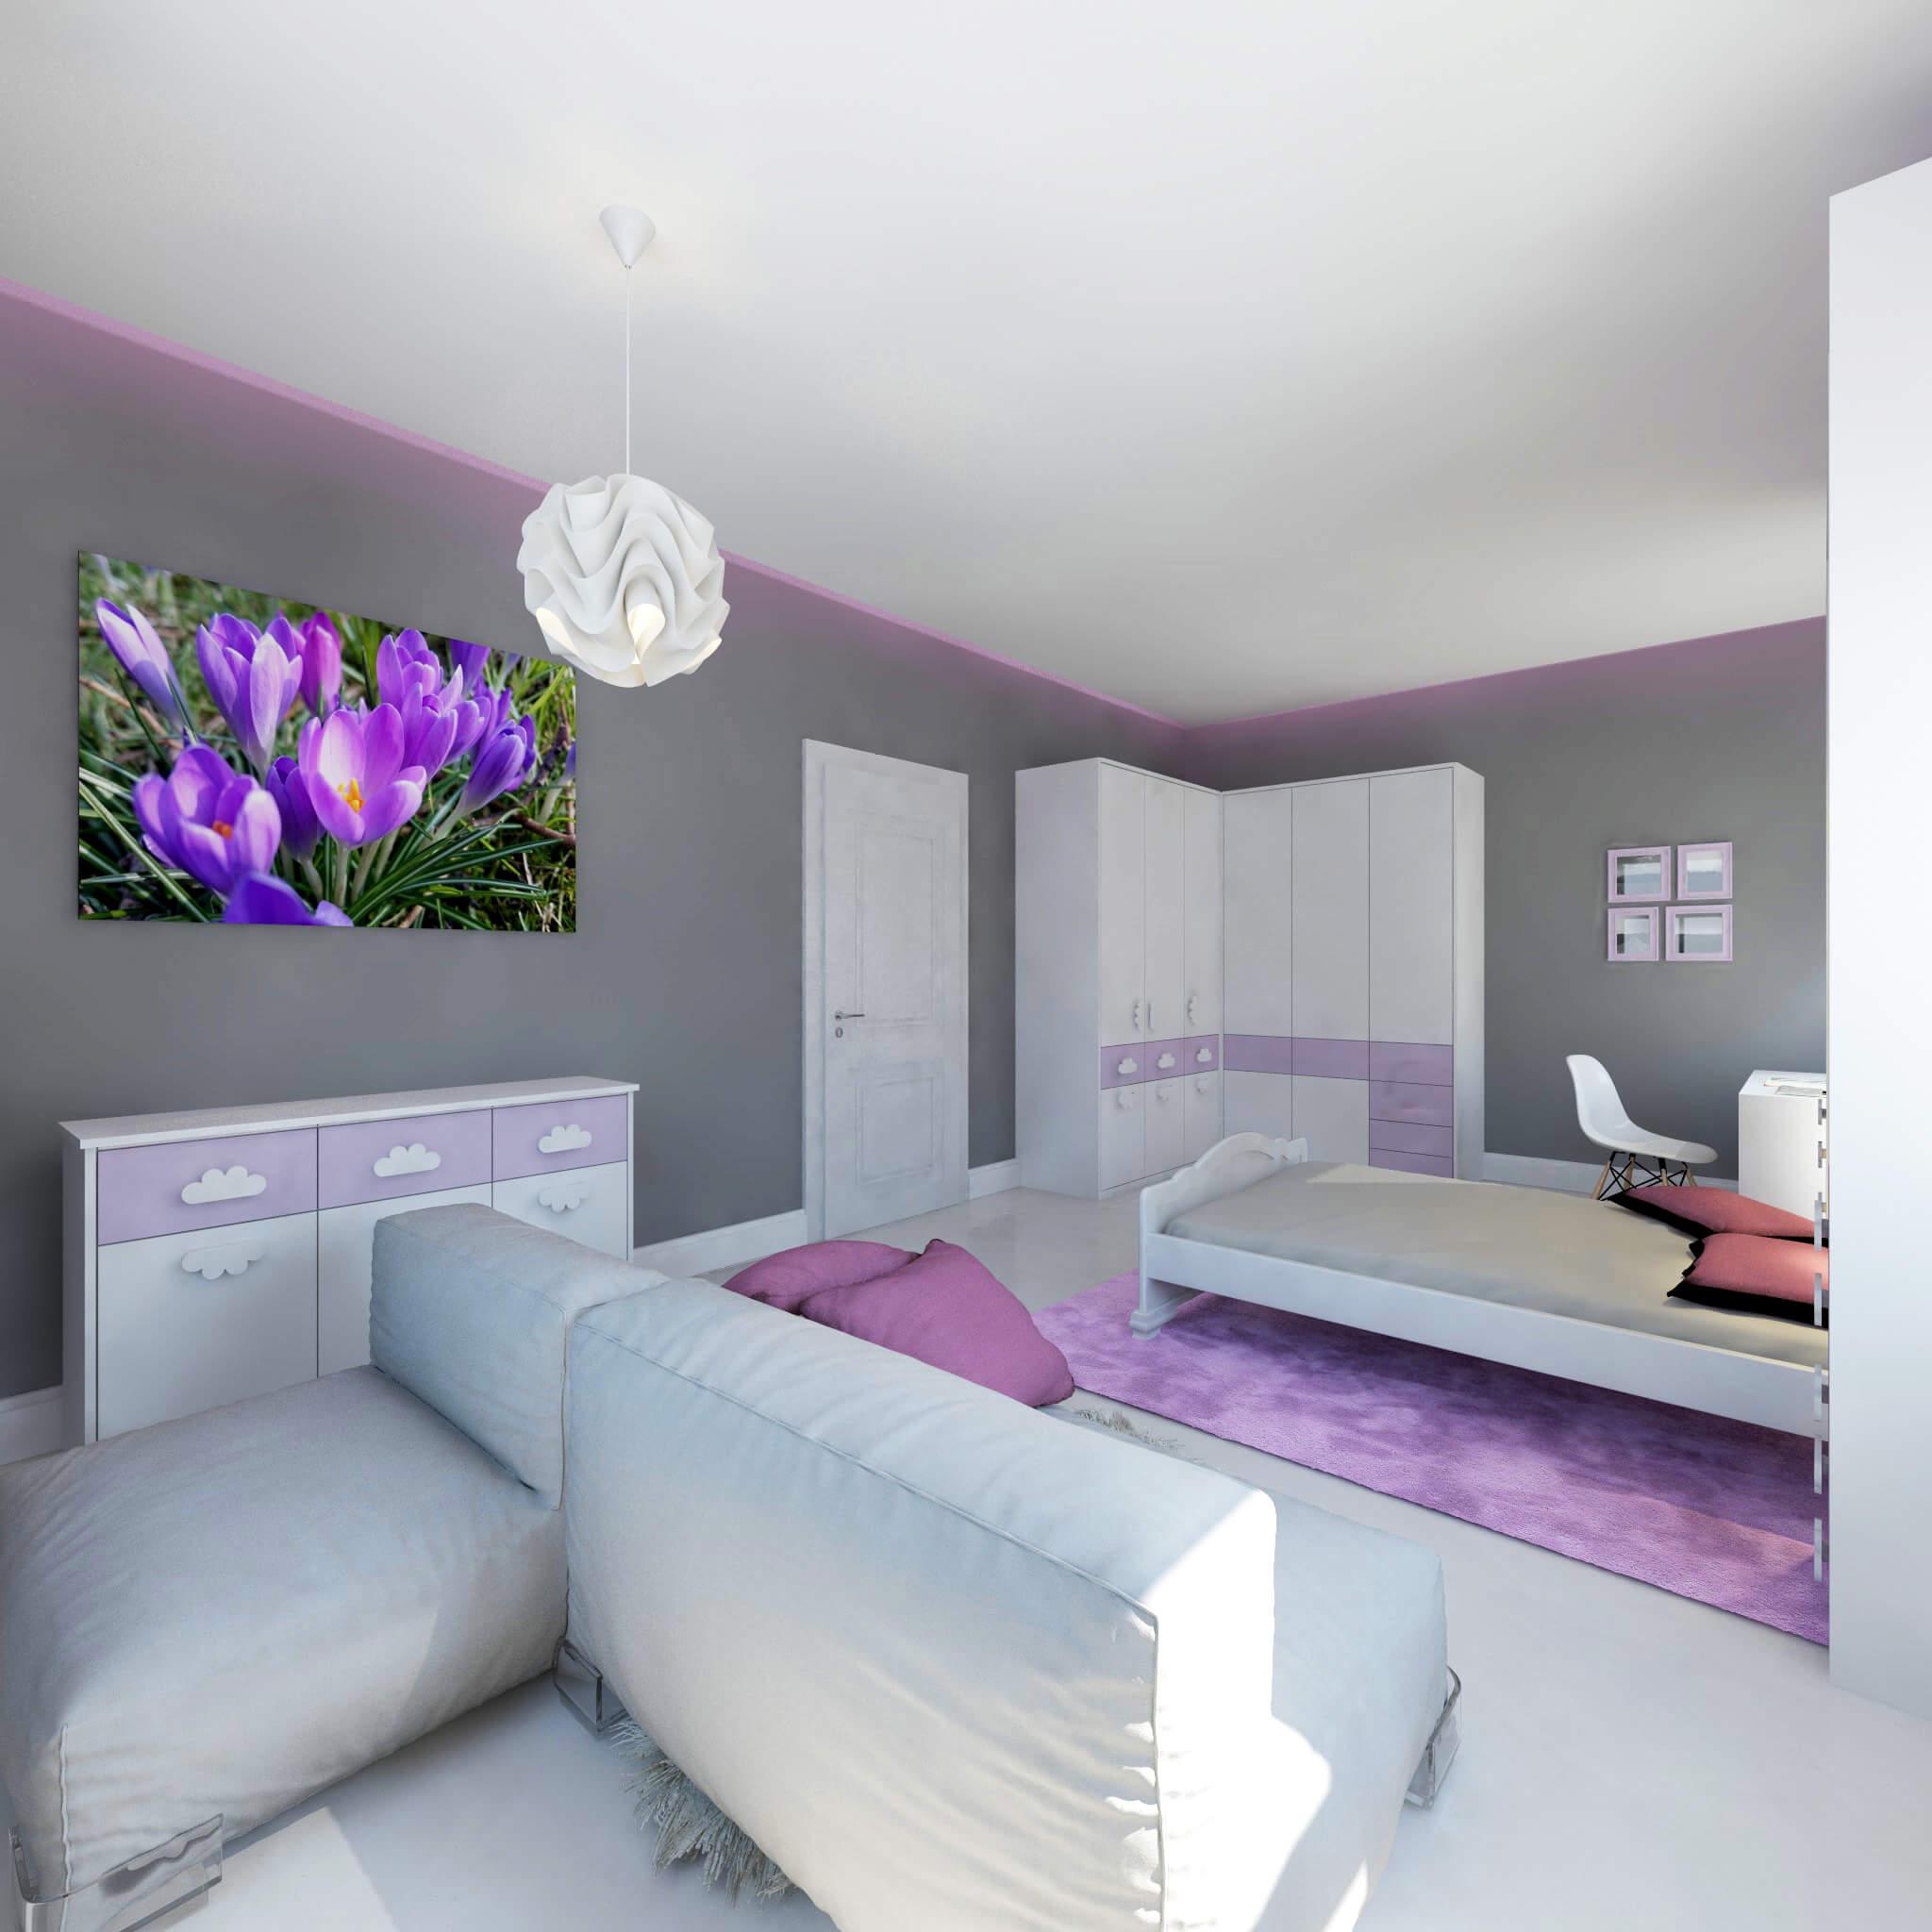 Jugendzimmer Design by Torsten Müller aus Bad Honnef nähe Köln Bonn Verkauf Beratung Planung Interior Designer 3D Lifestyle- (10)